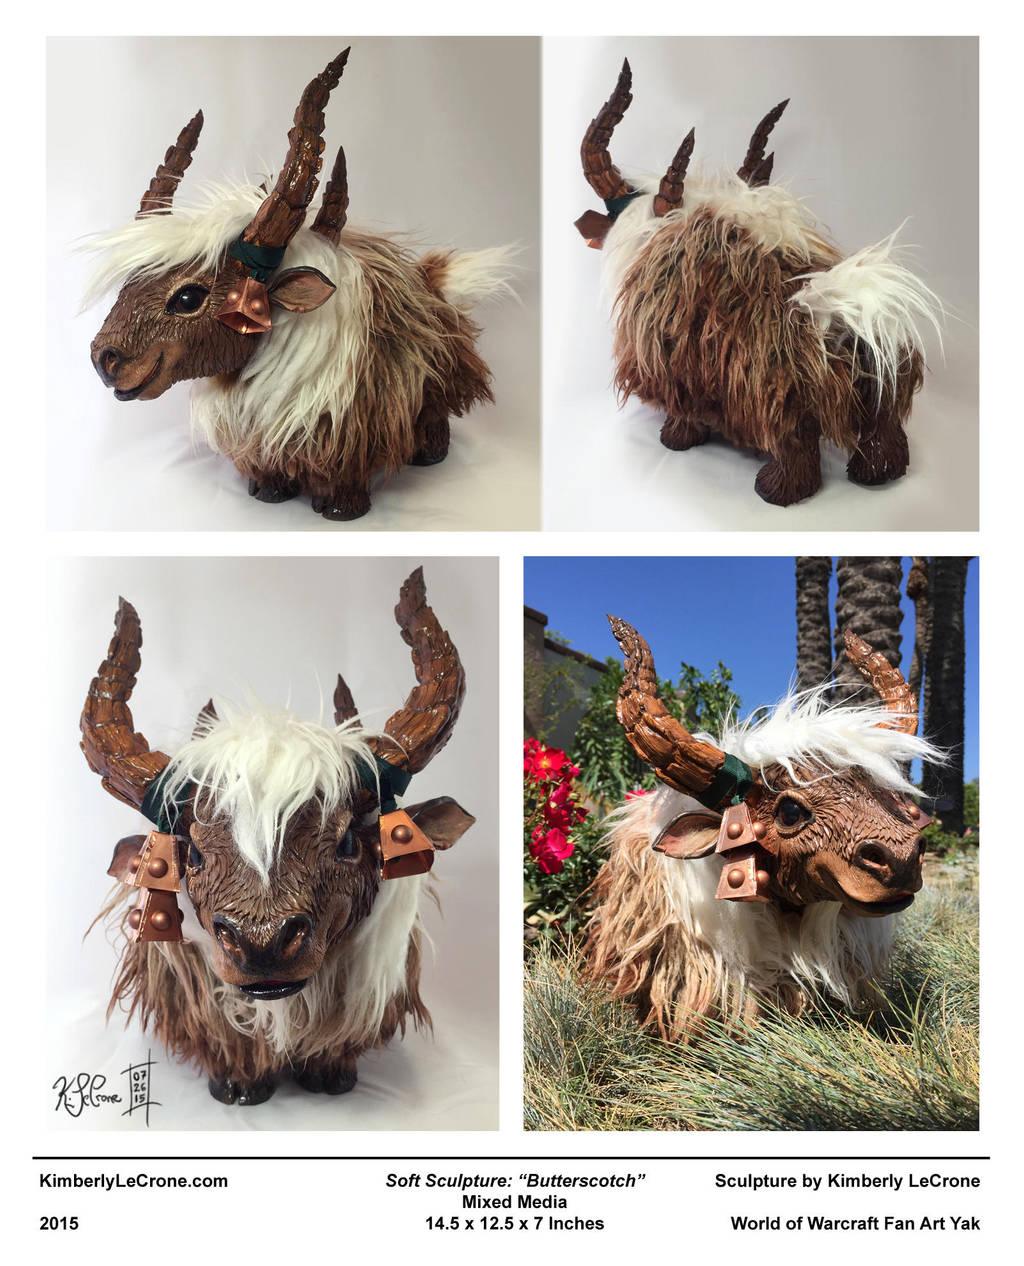 'Butterscotch' - World of Warcraft Fan Art Yak by Dreamspirit